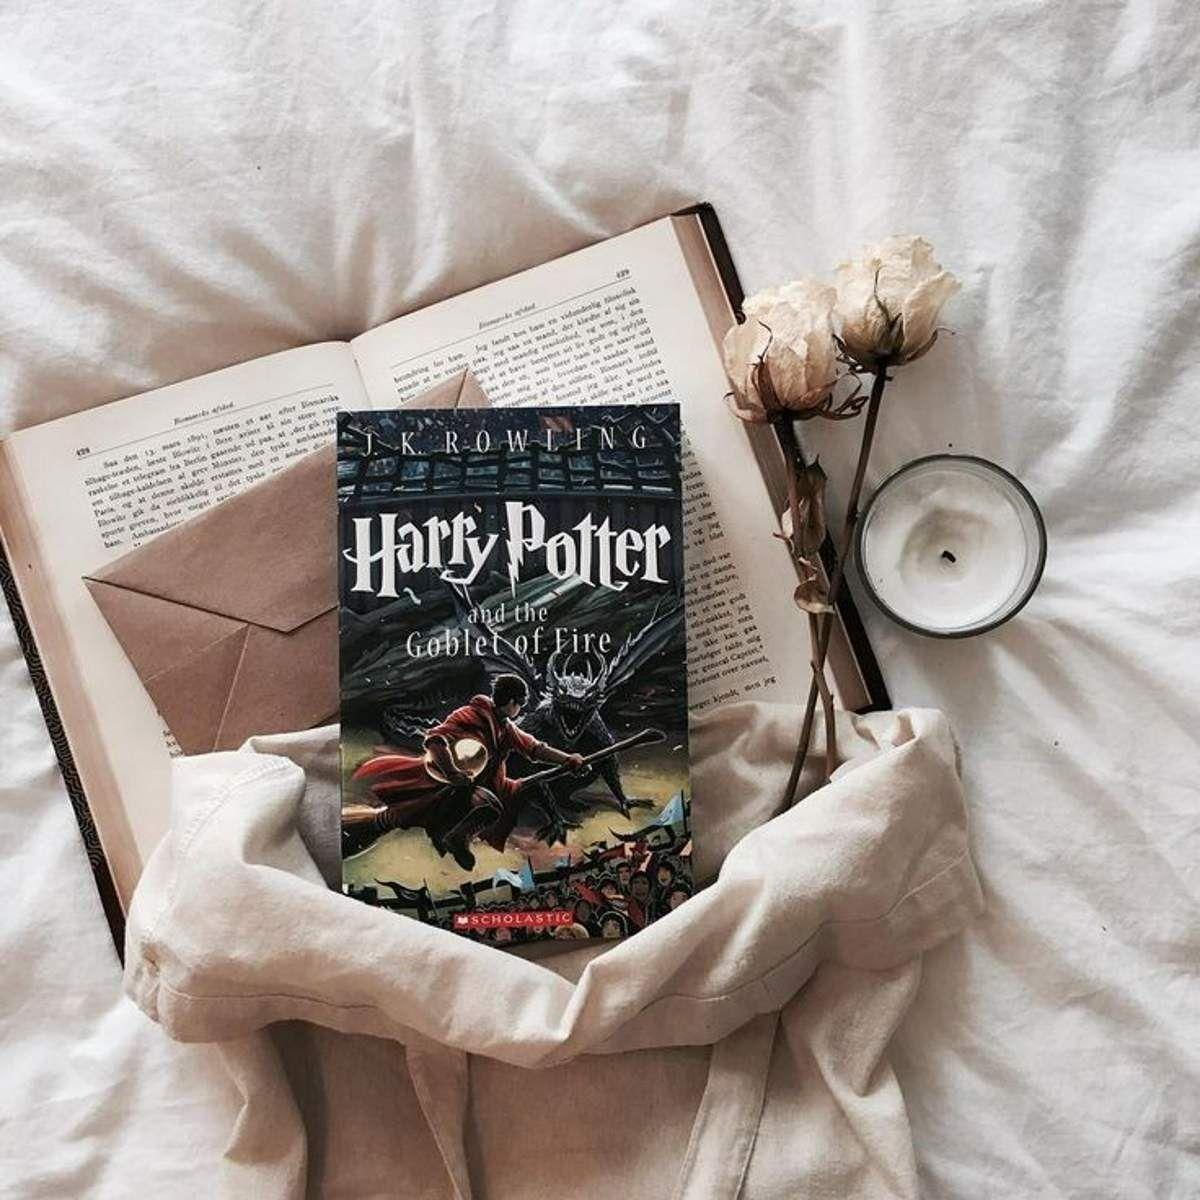 Pawanmanj Book Photography Harry Potter Books Book Flatlay